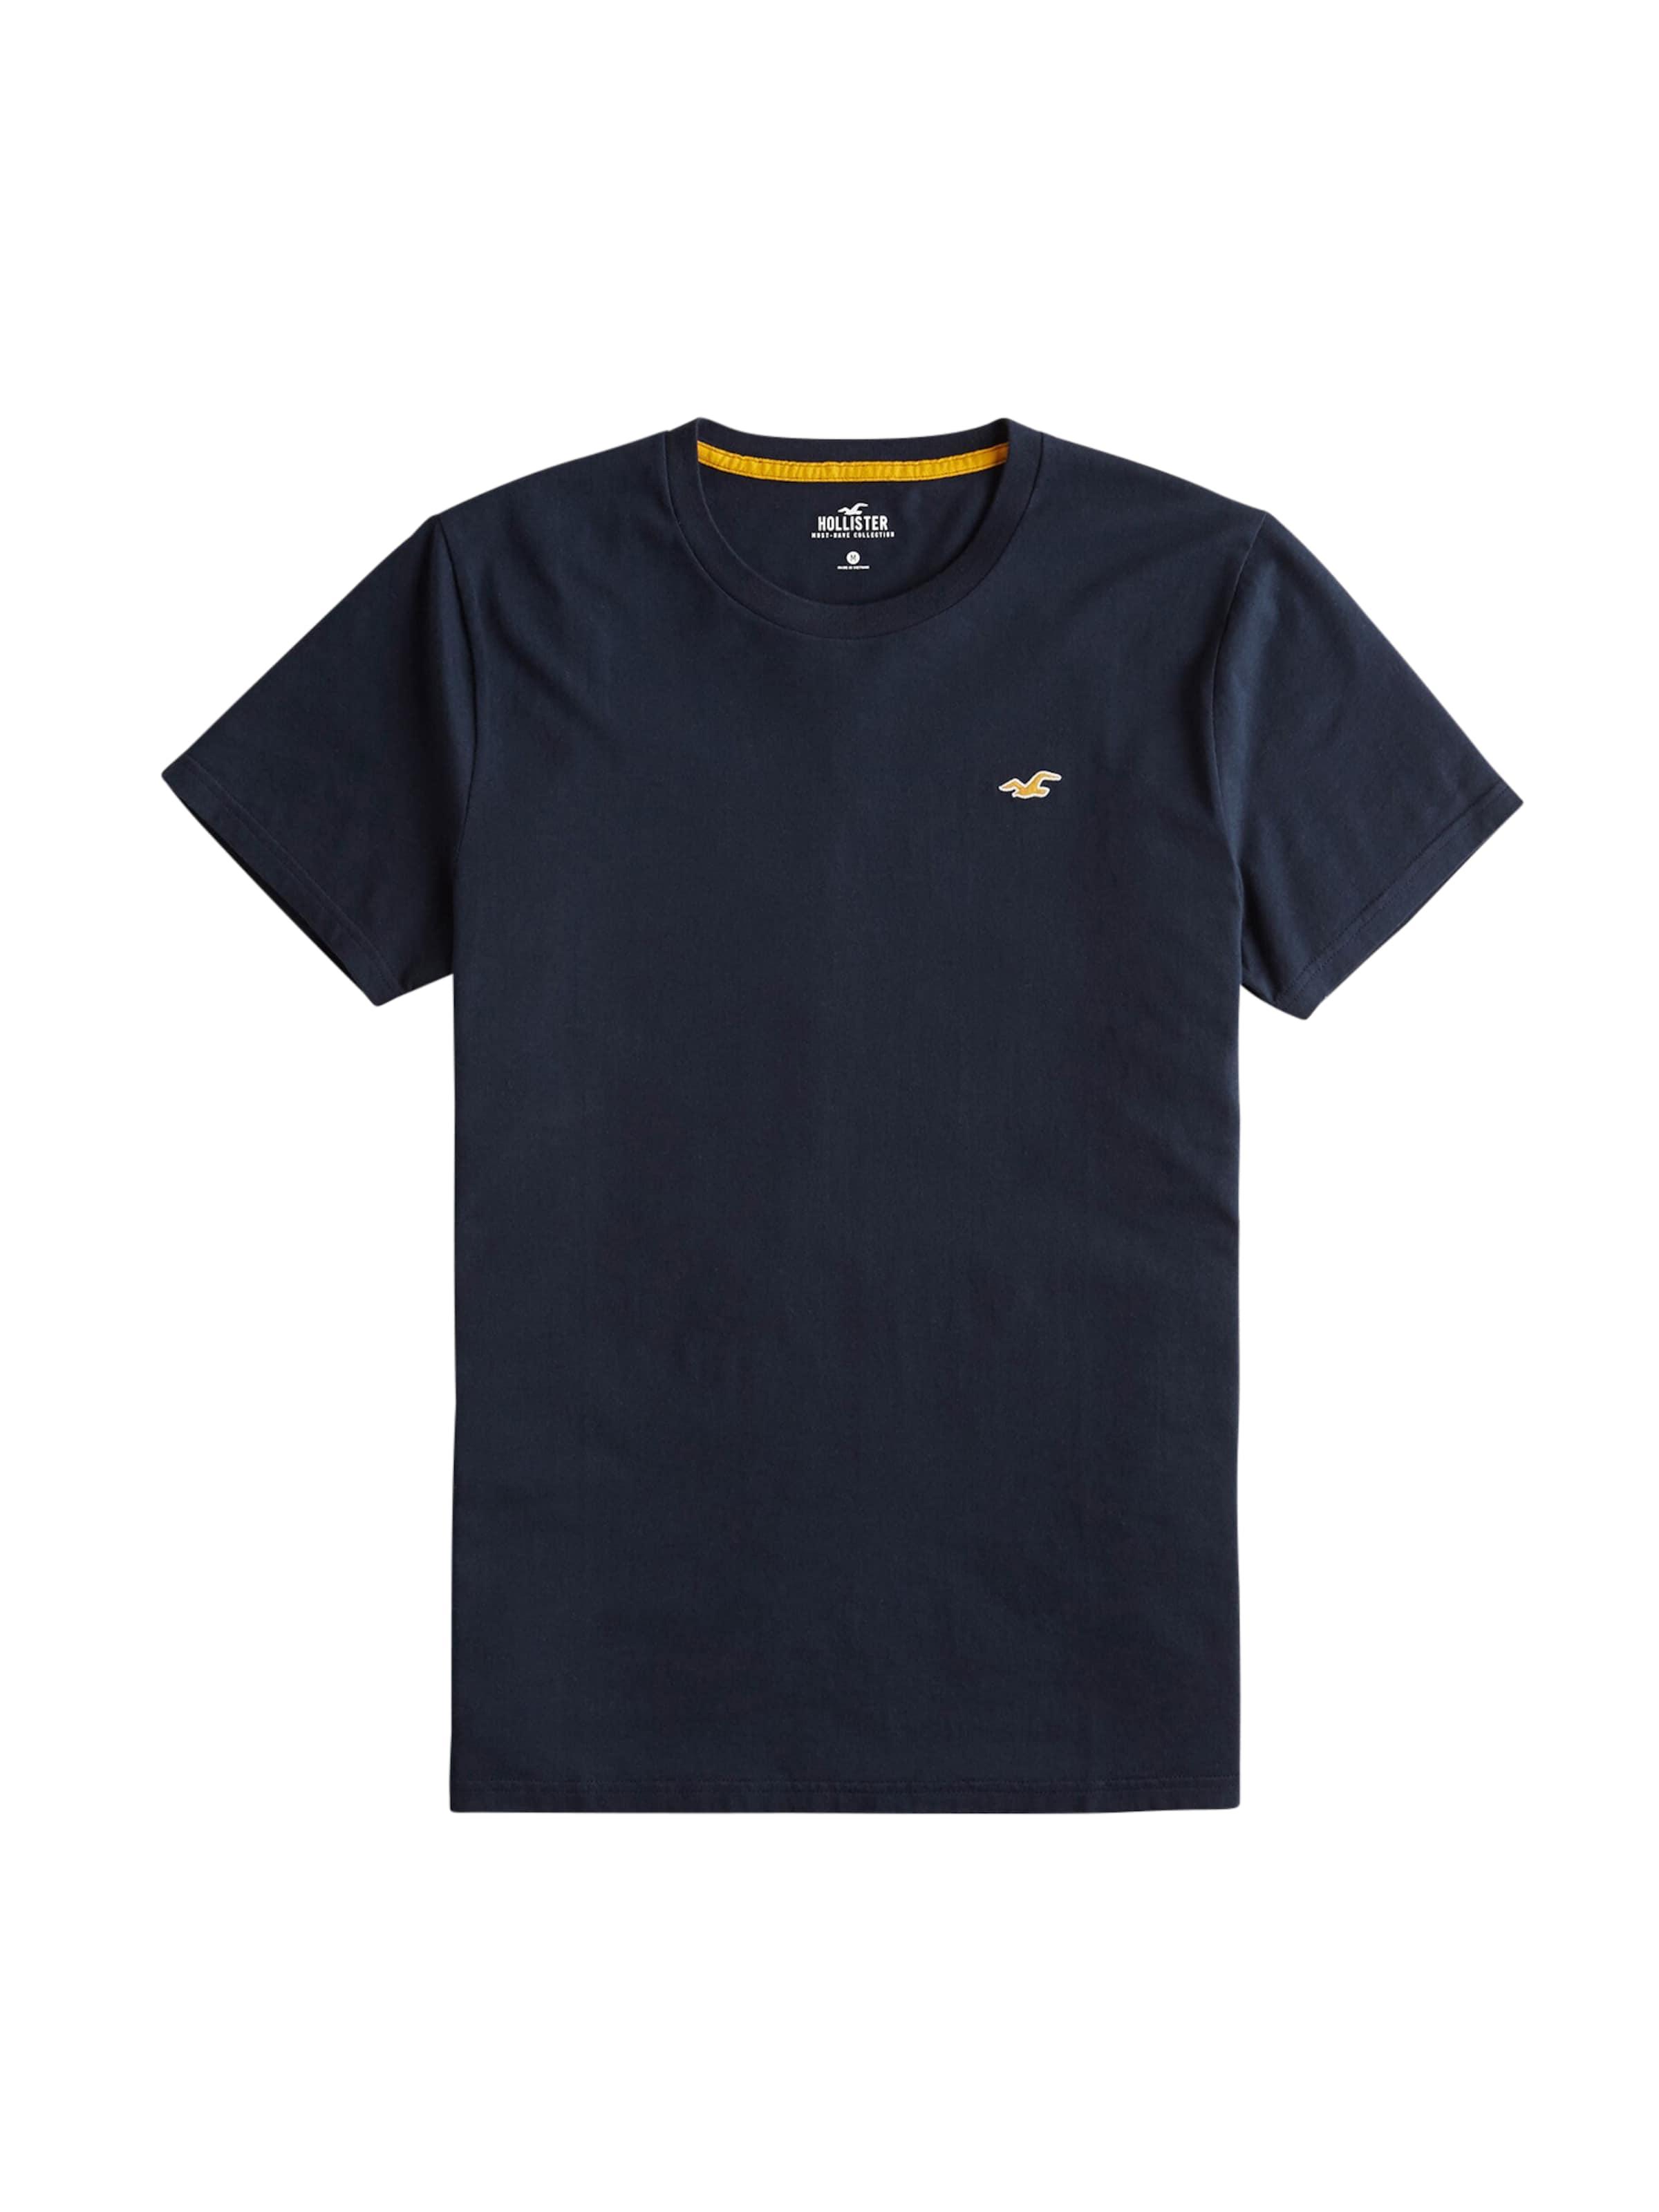 shirt En Bleu Hollister T Marine m8yvwnN0O